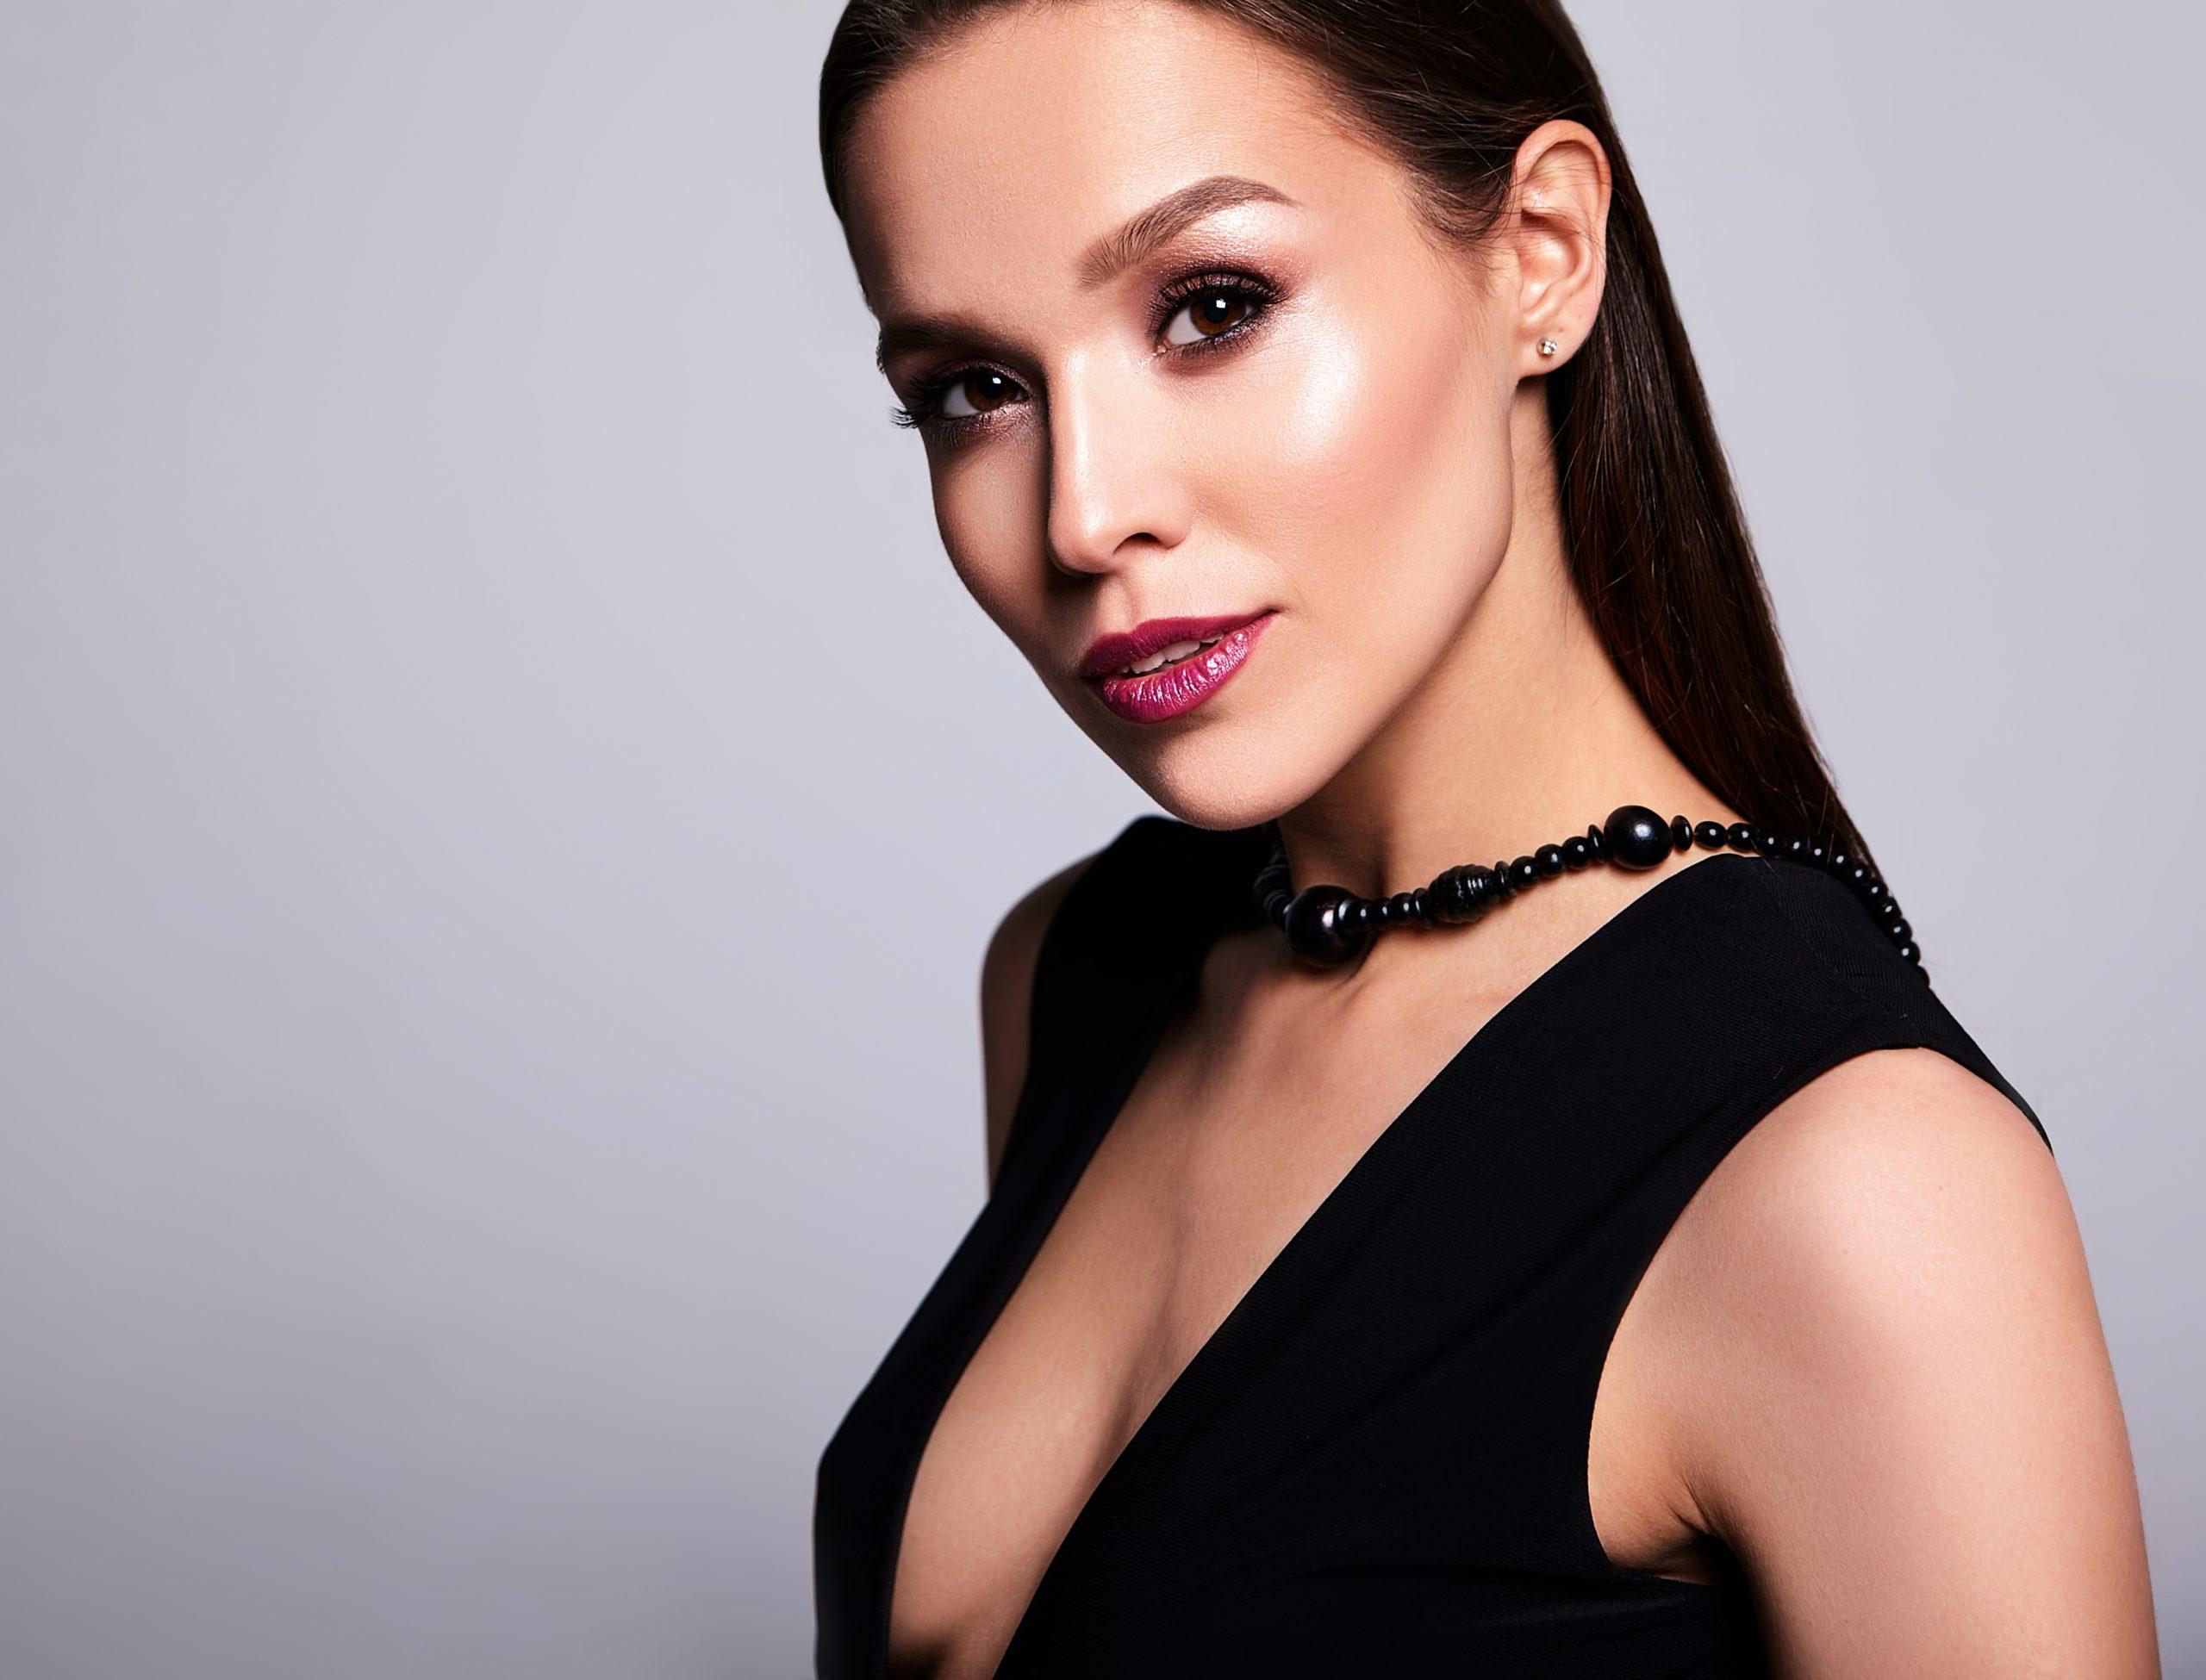 Spanish beautiful smiling brunette woman